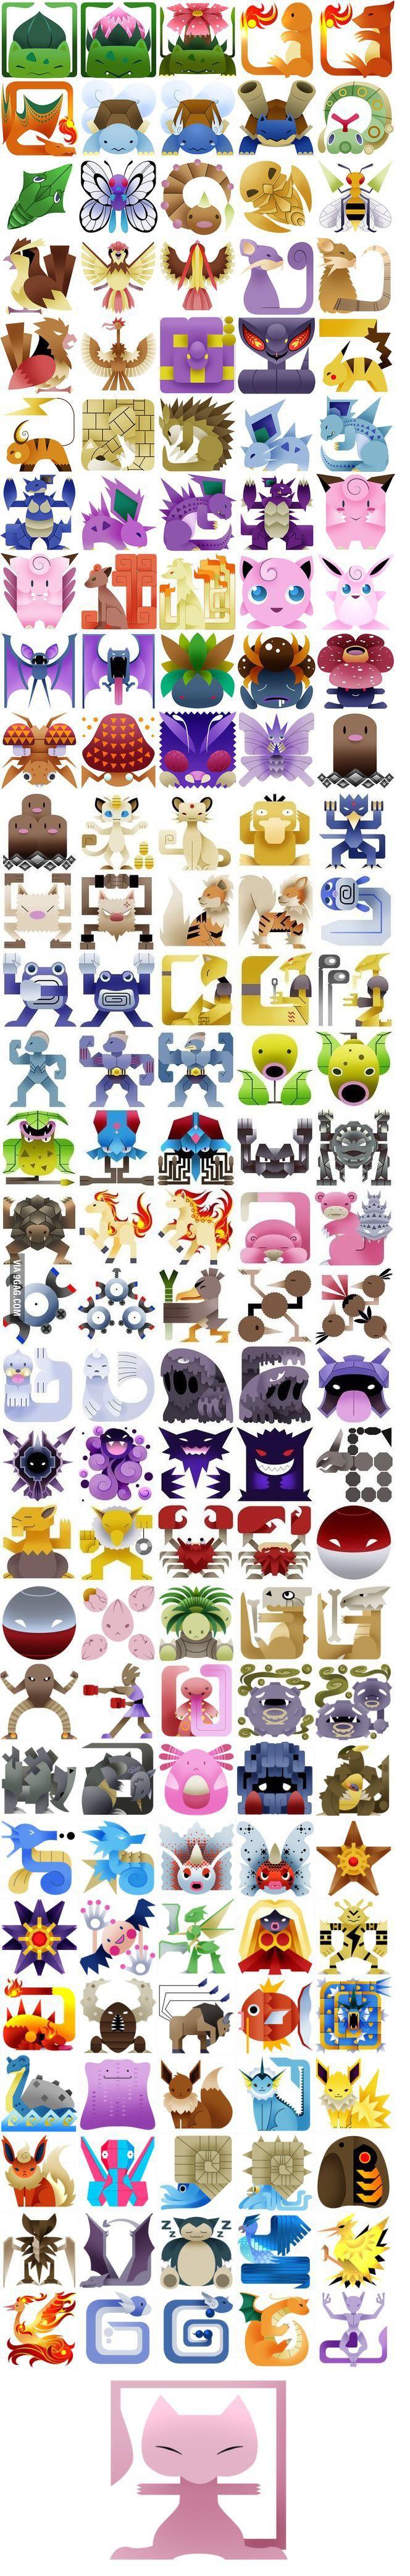 23++ Teamspeak icon ideas in 2021